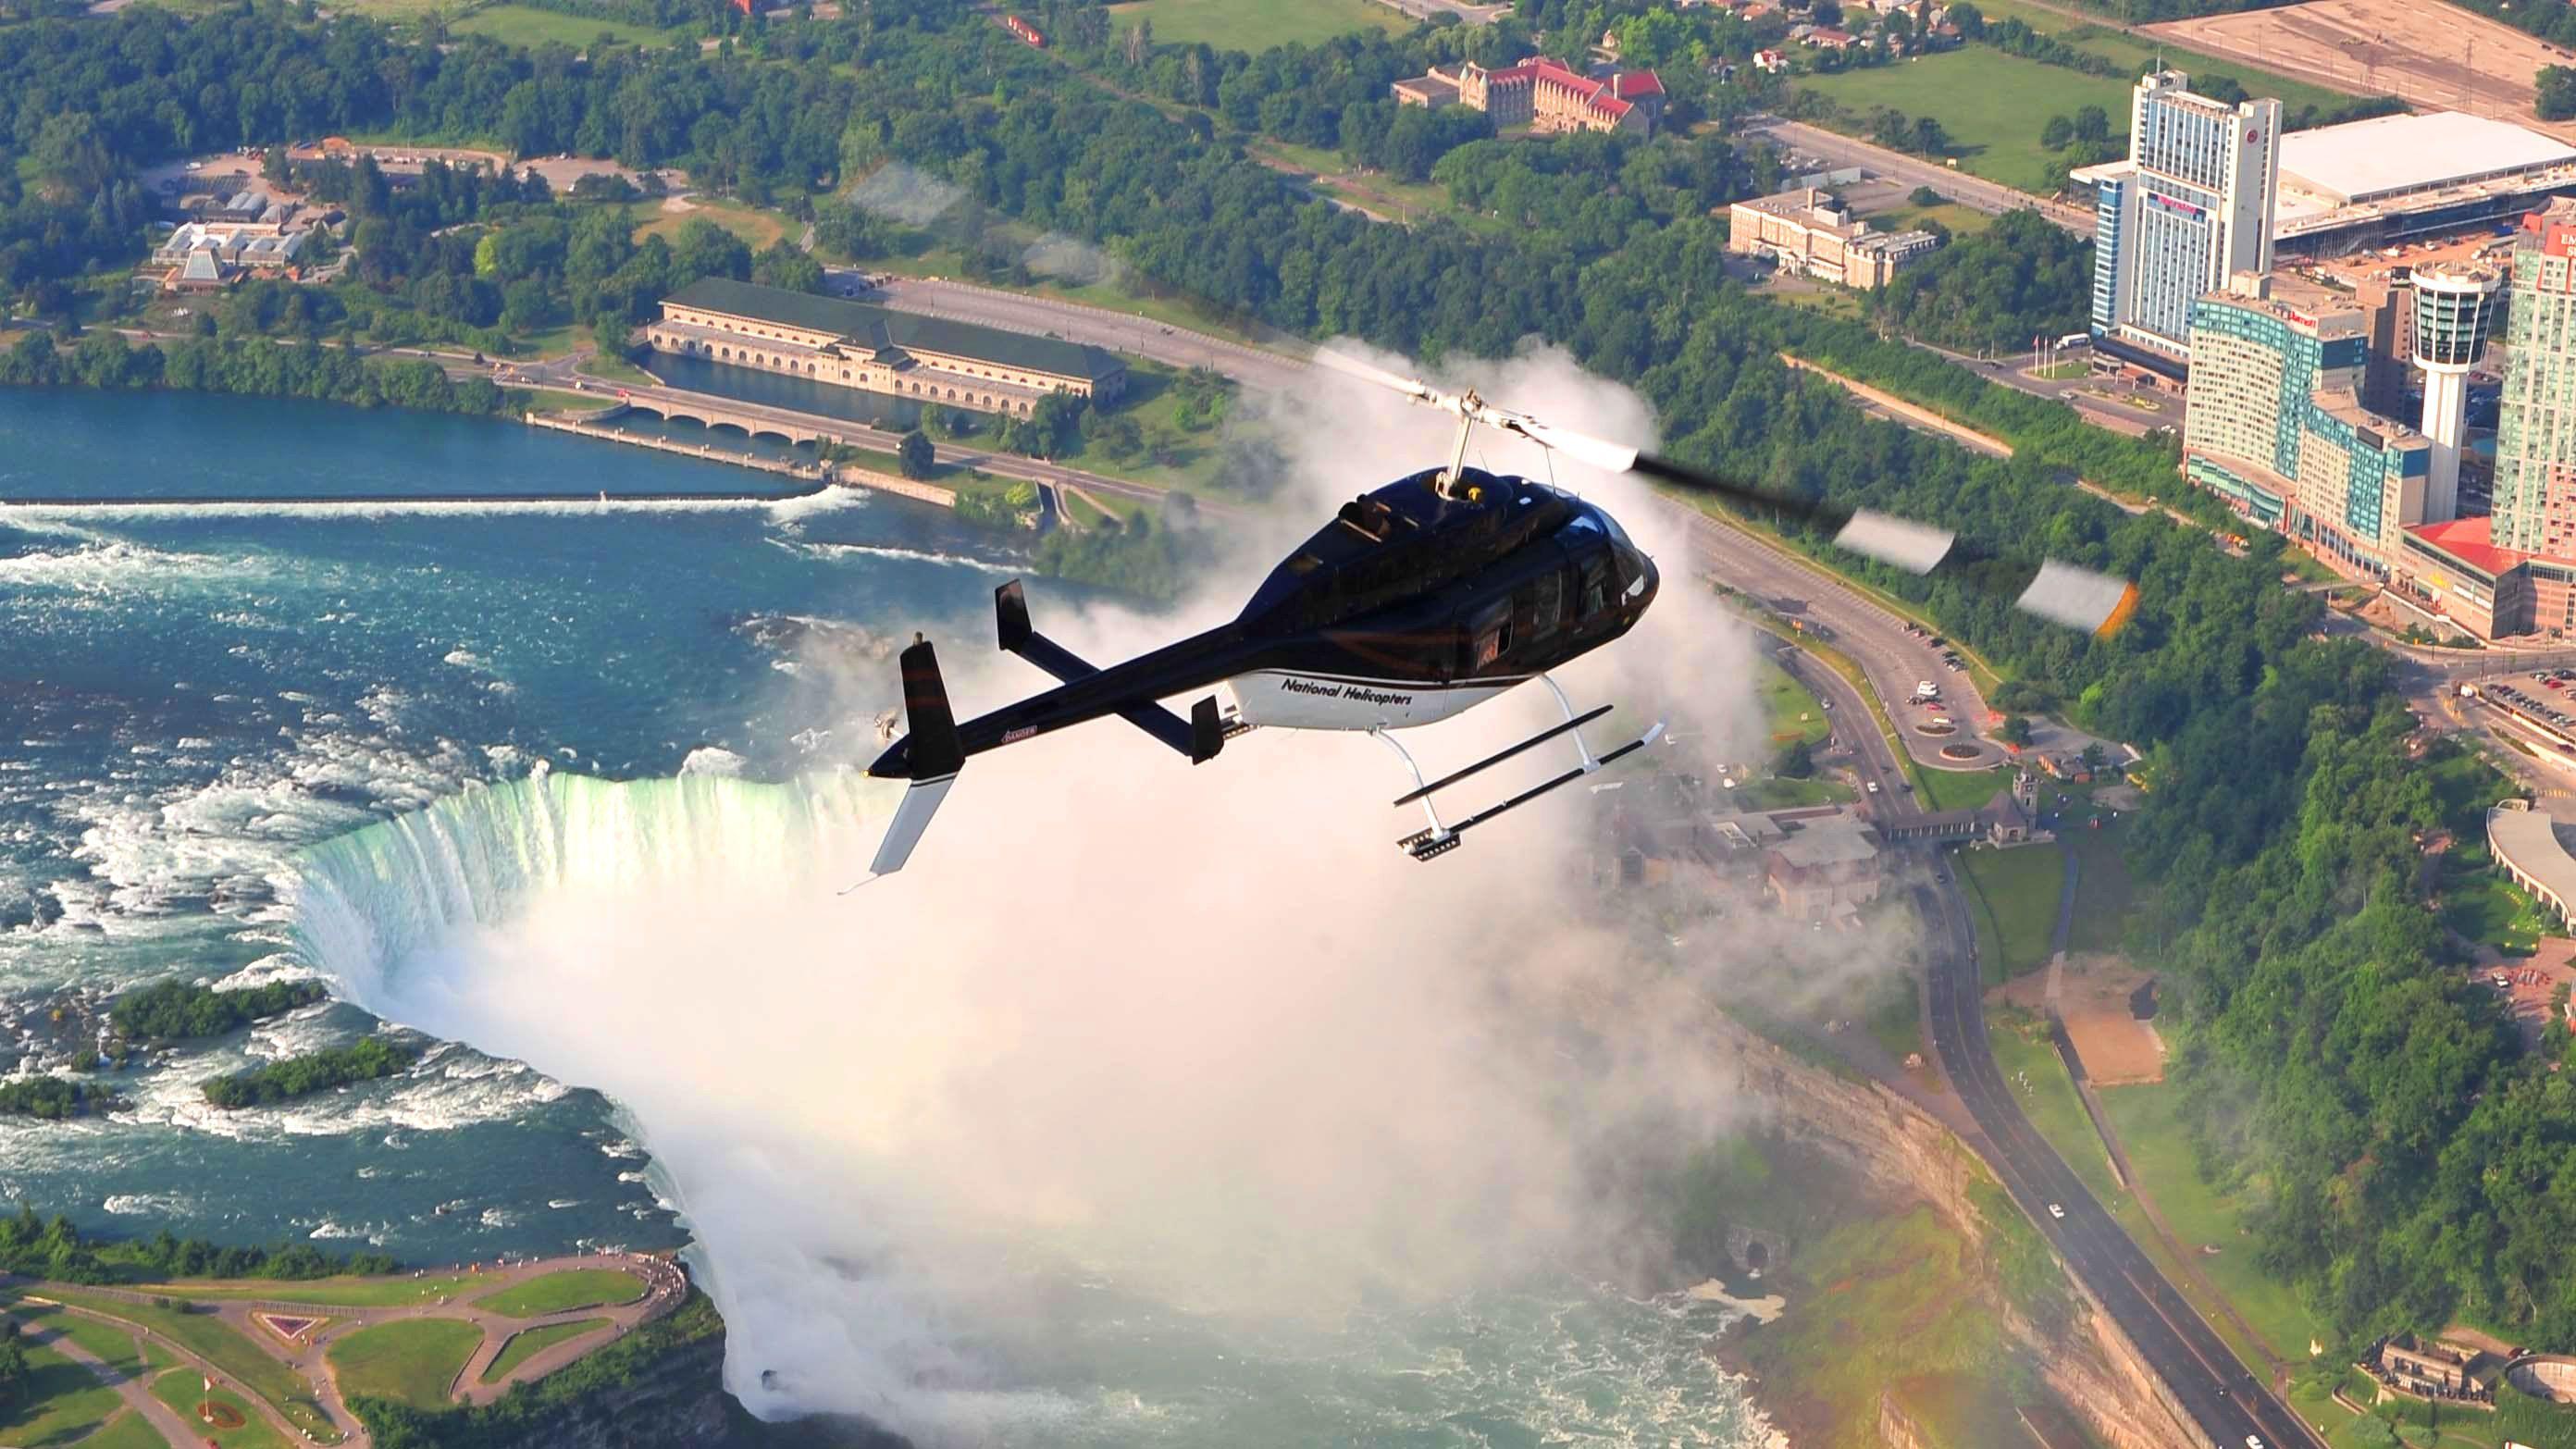 Helicopter flies above Niagara Falls